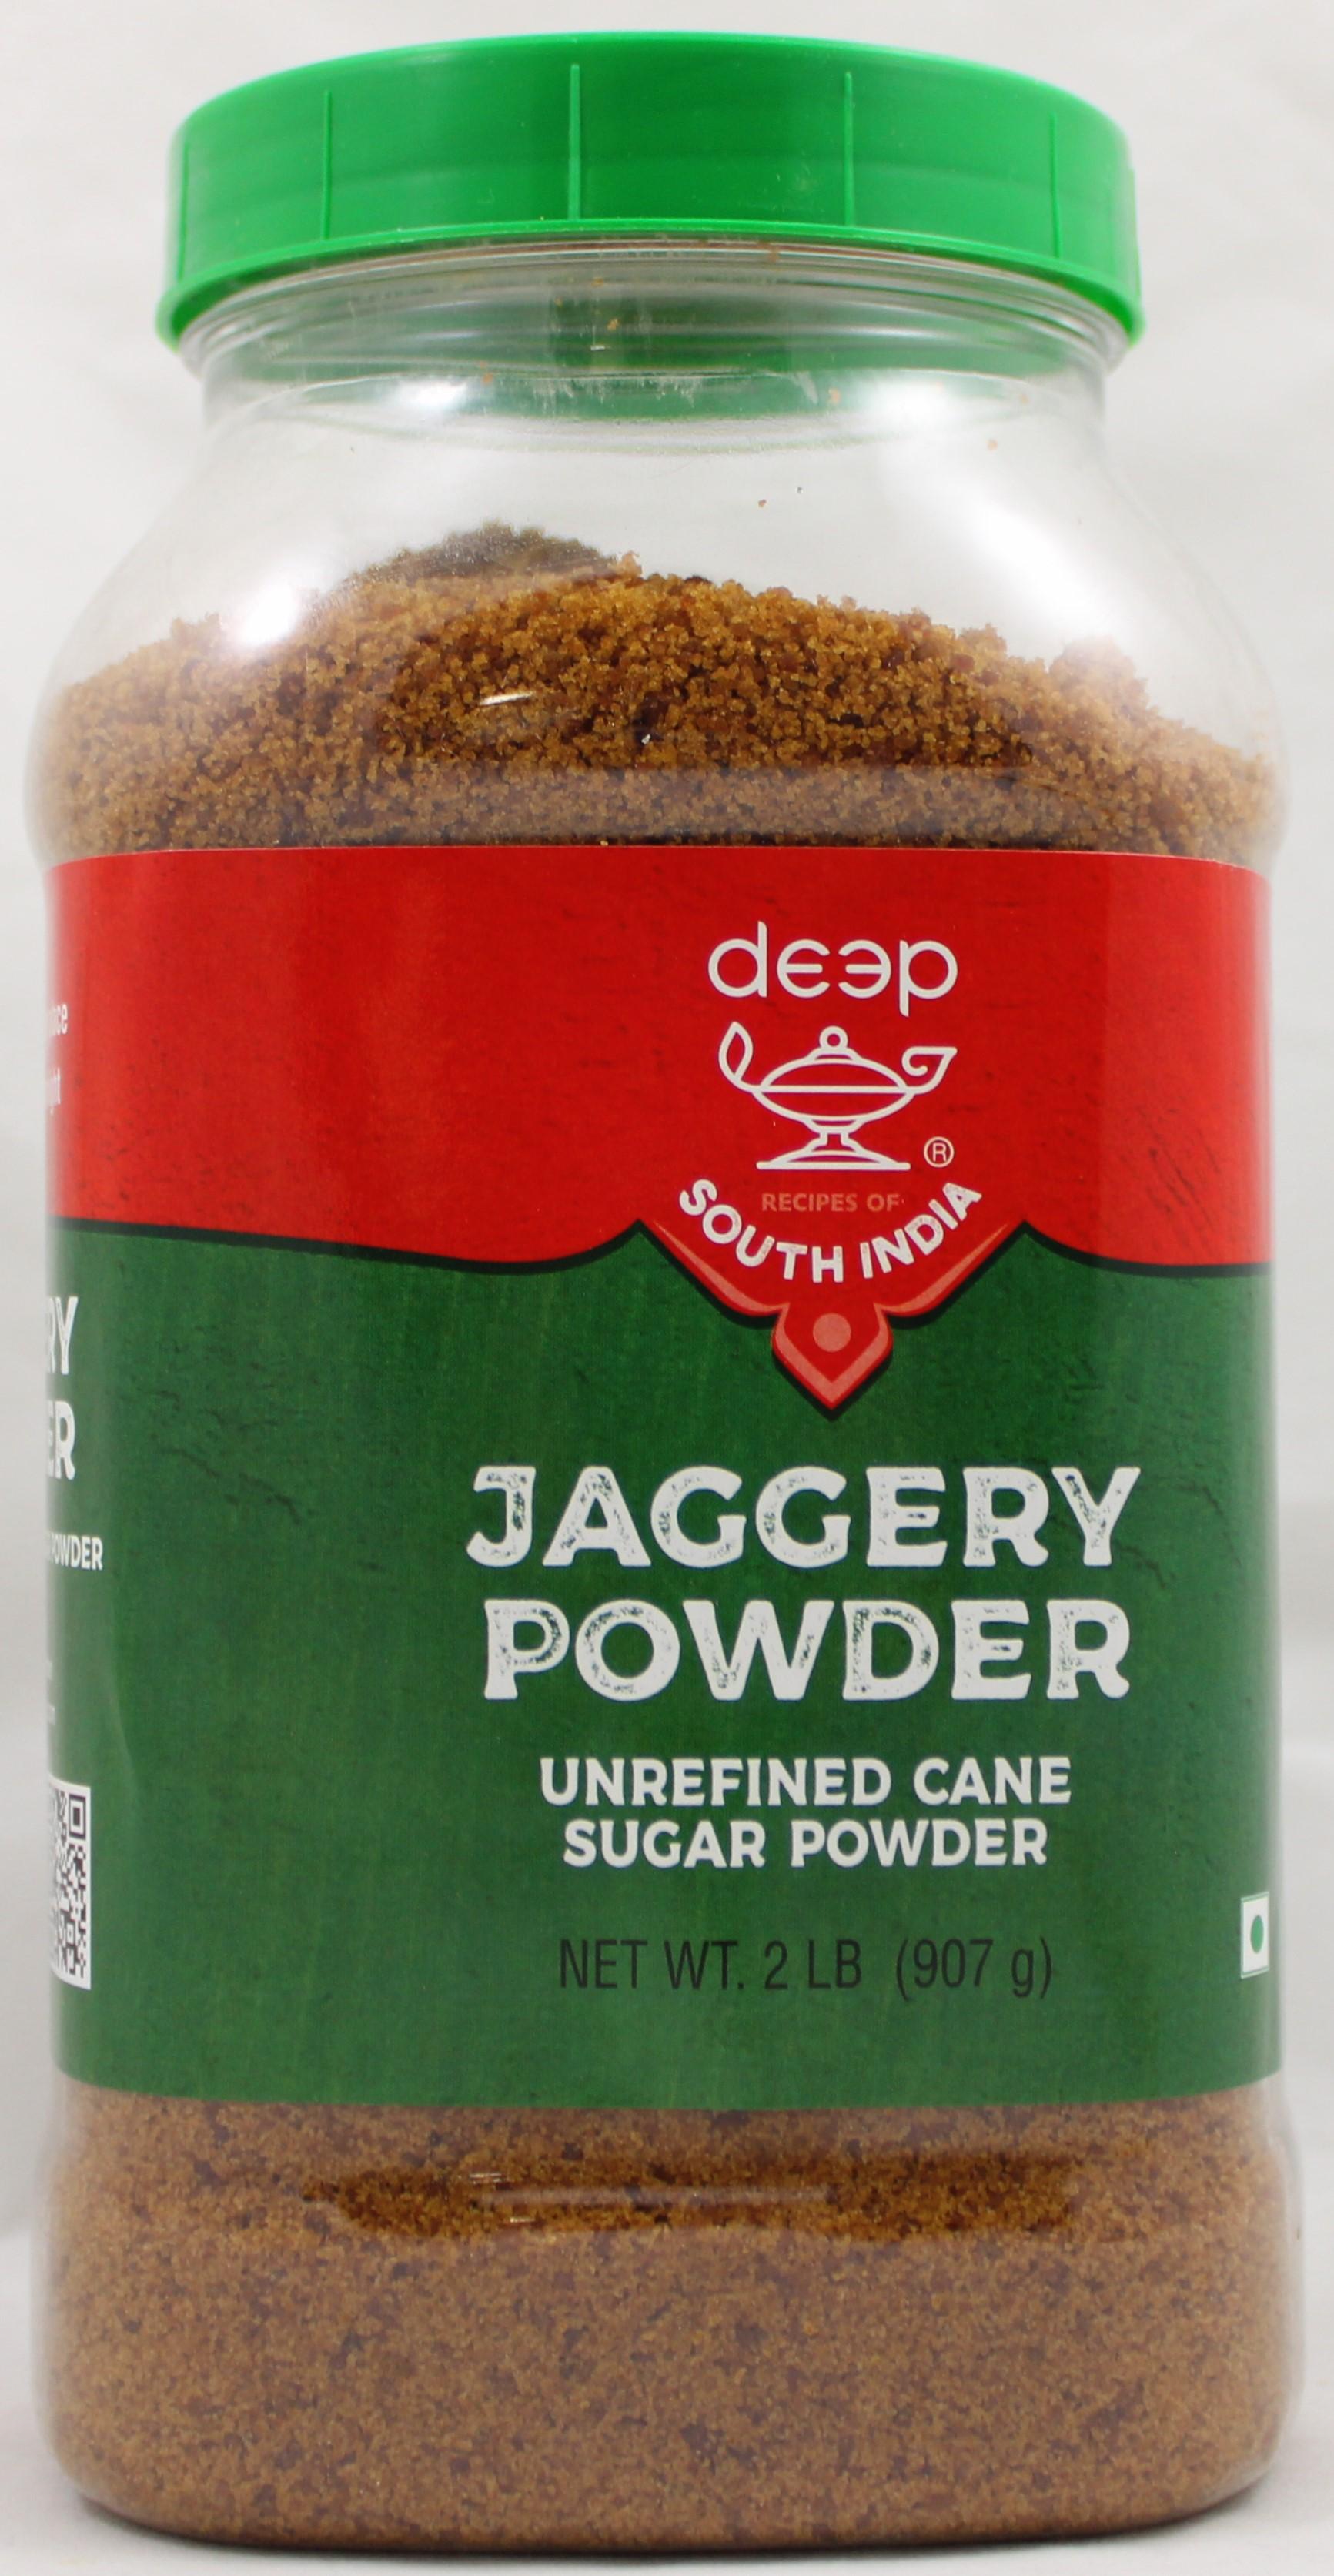 Jaggery Powder 2Lb